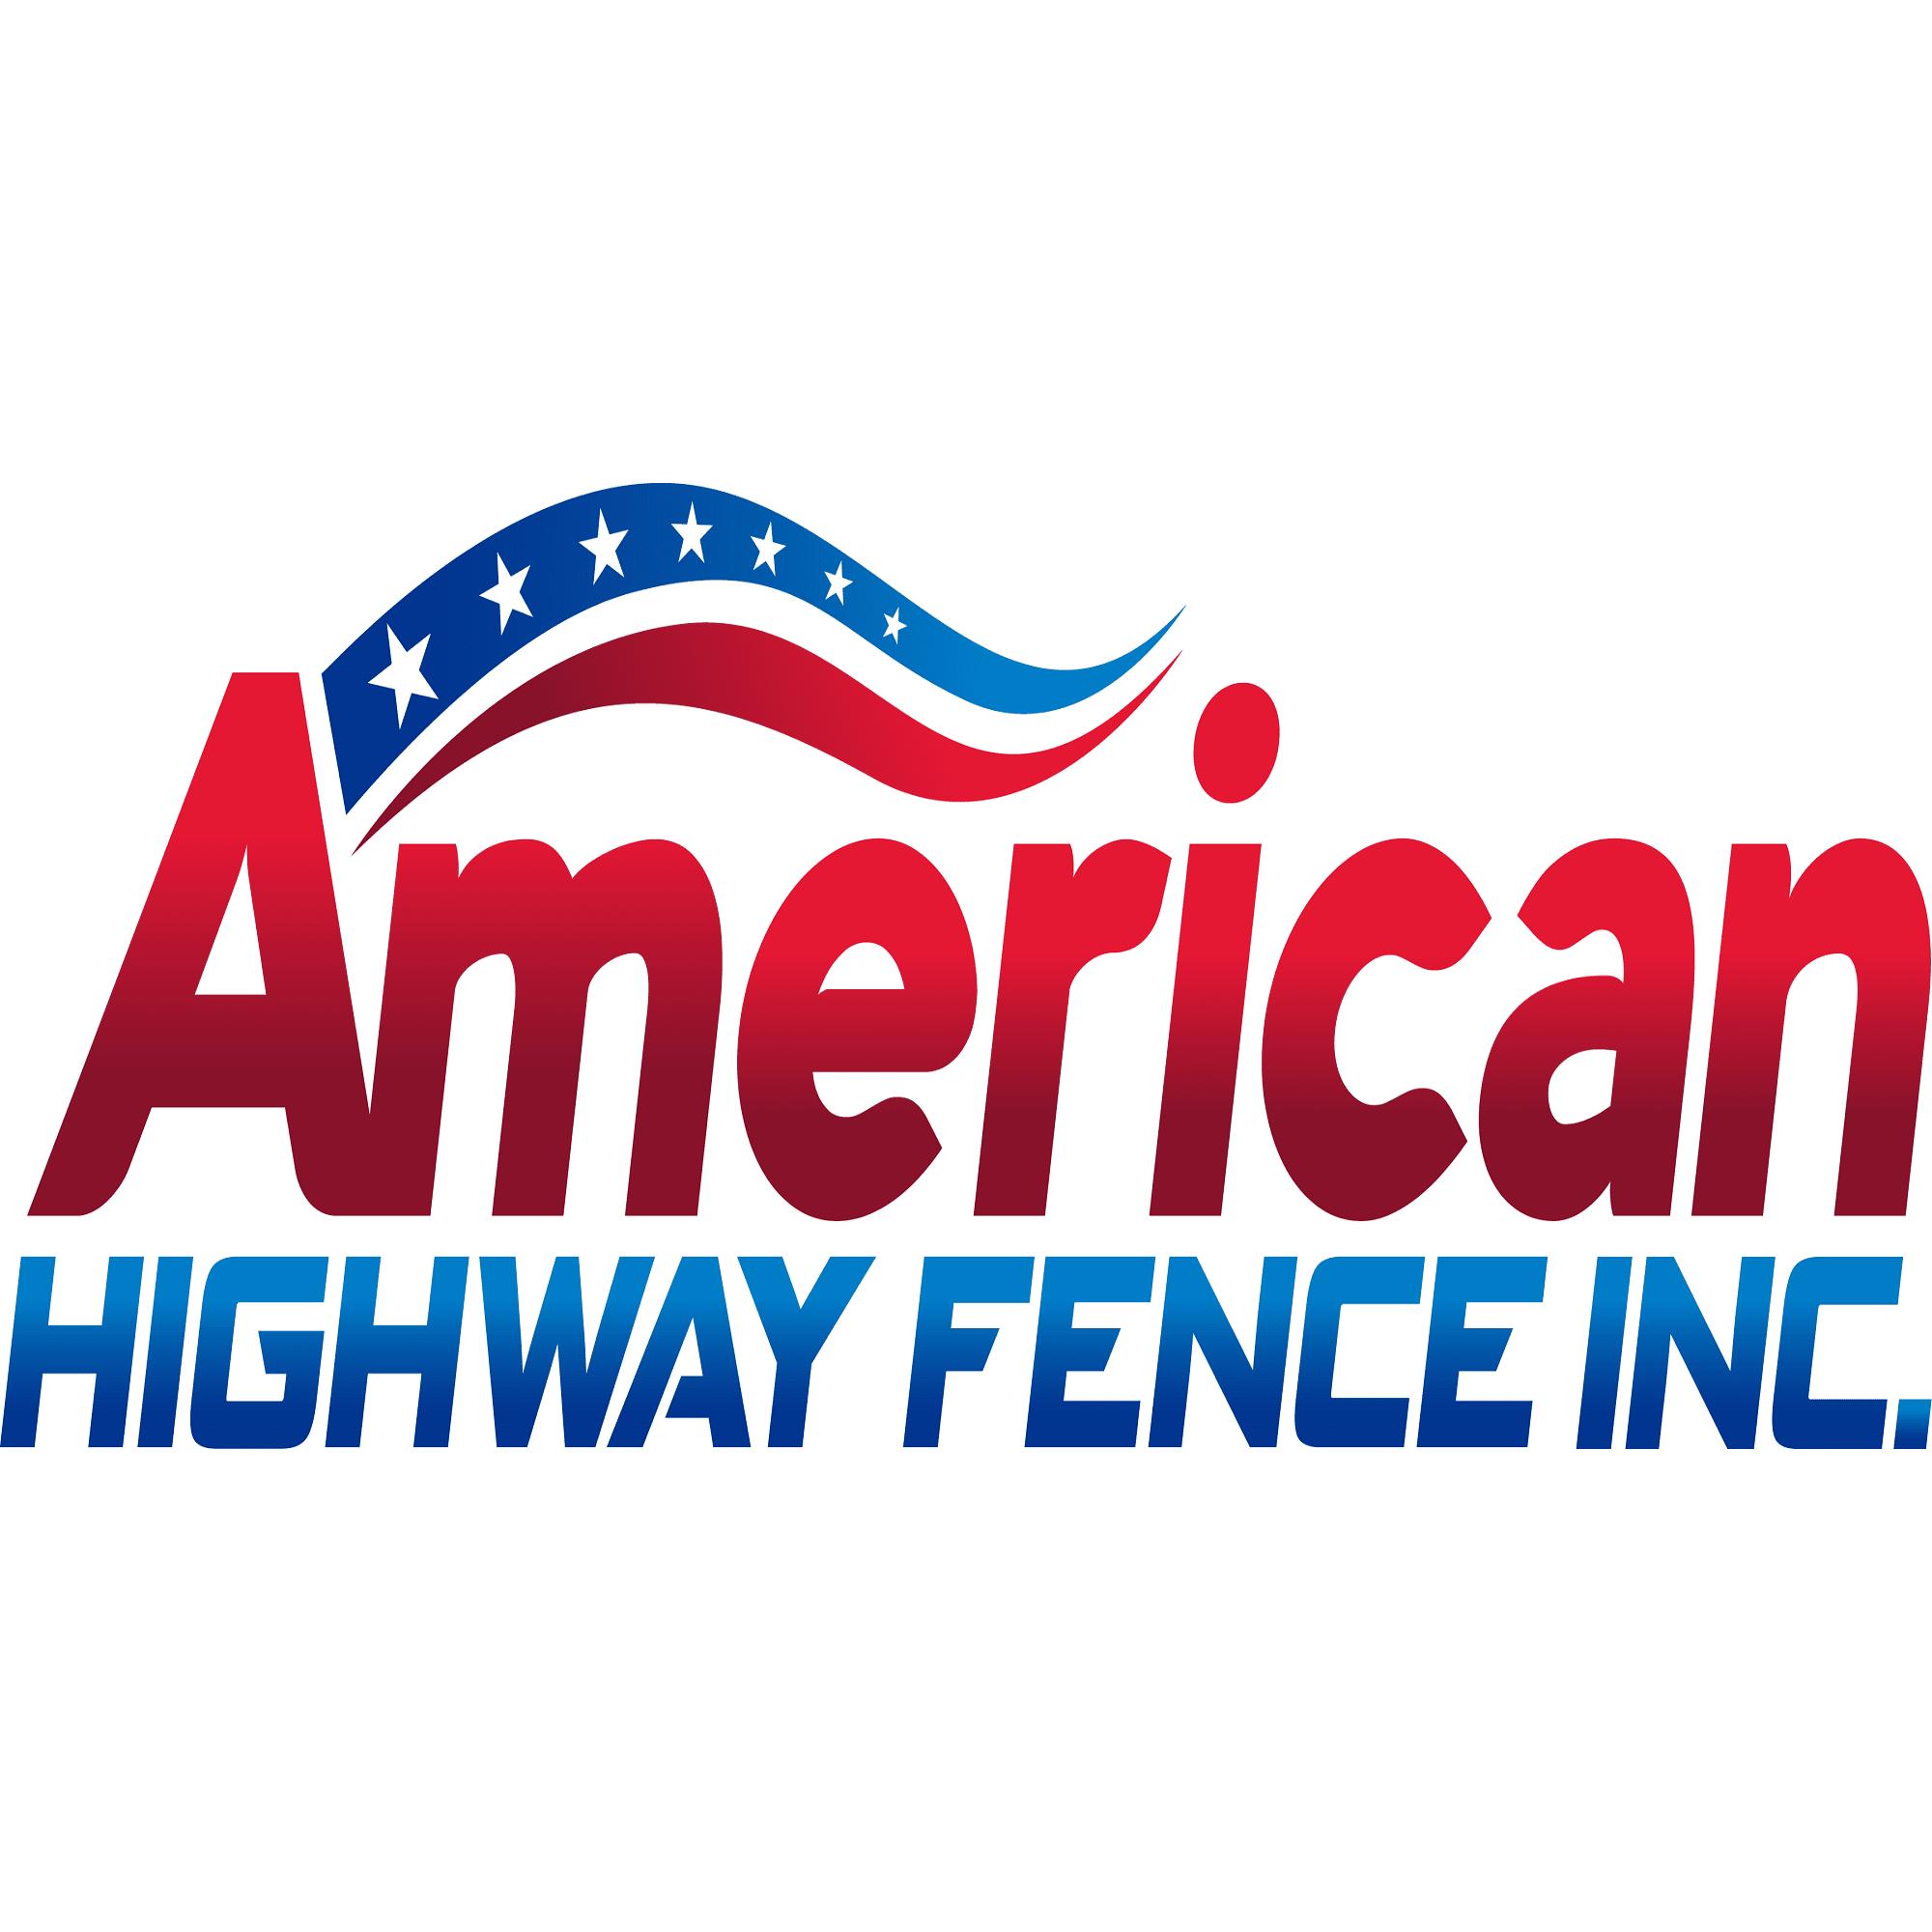 American Highway Fence Inc